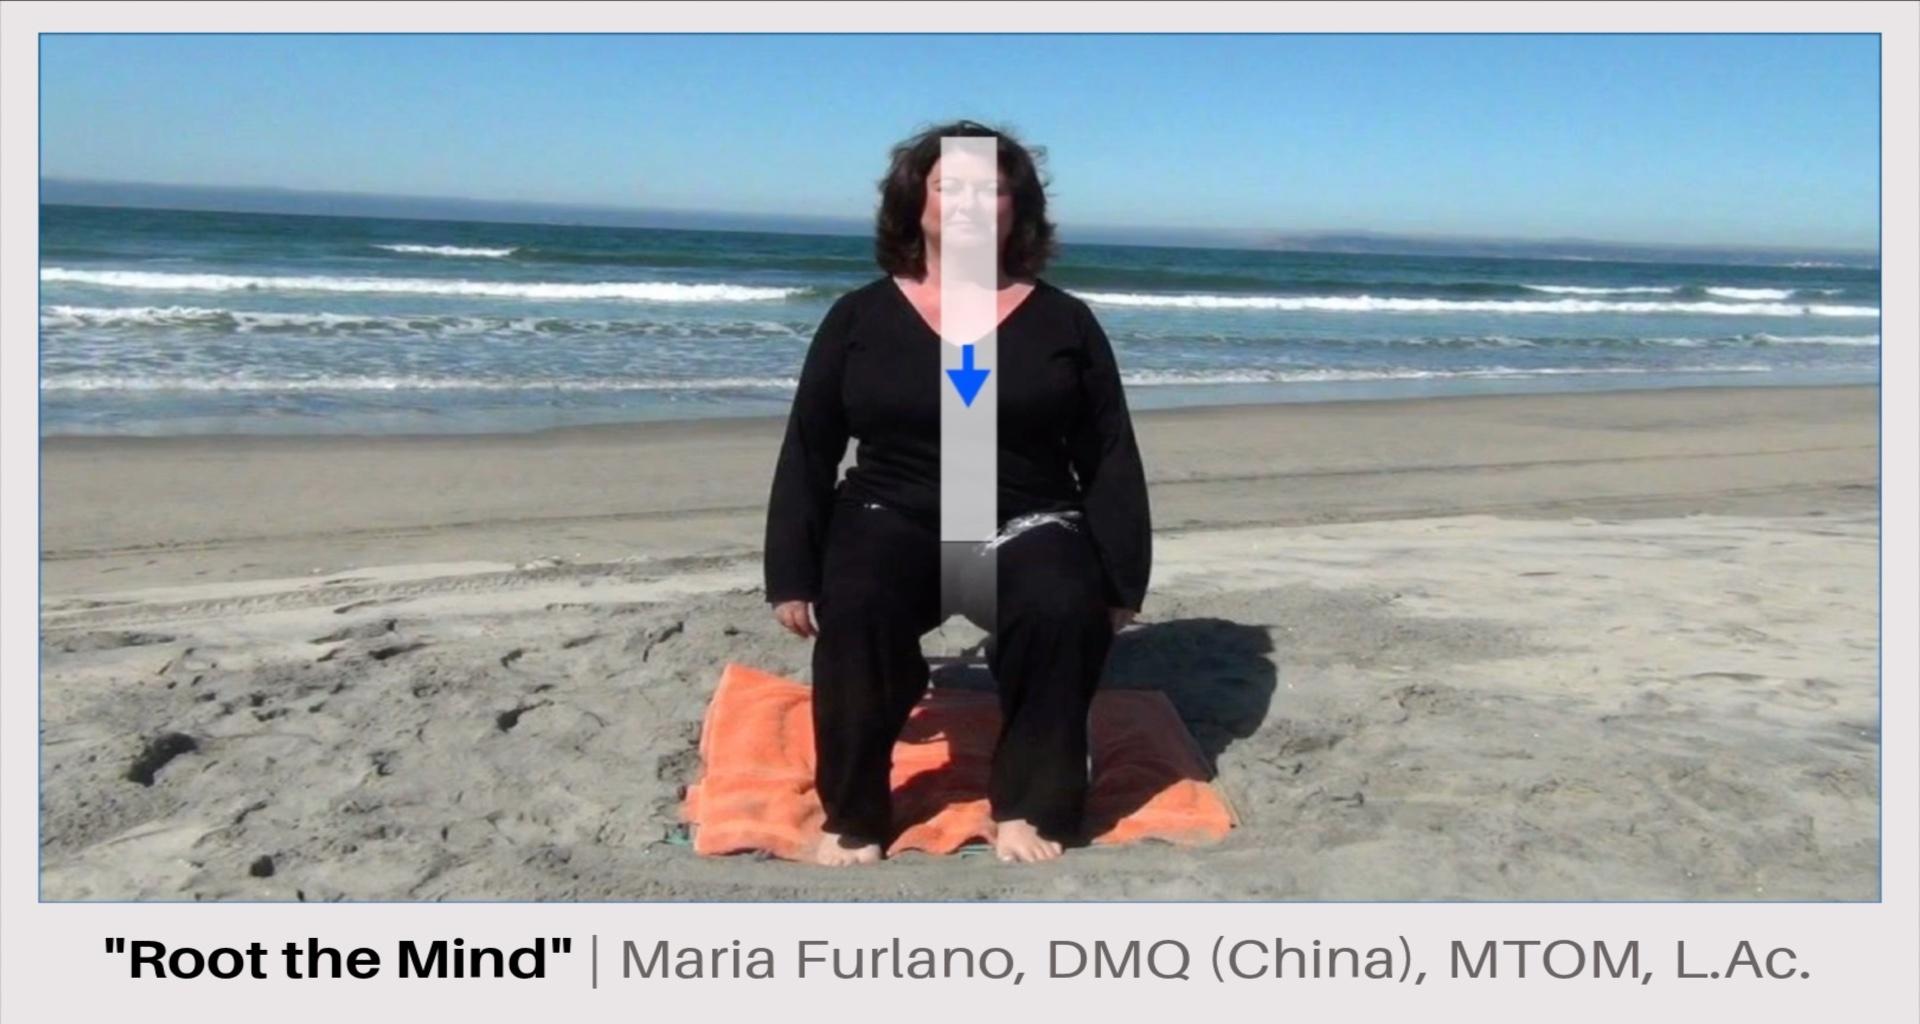 Maria Furlano on beach practicing